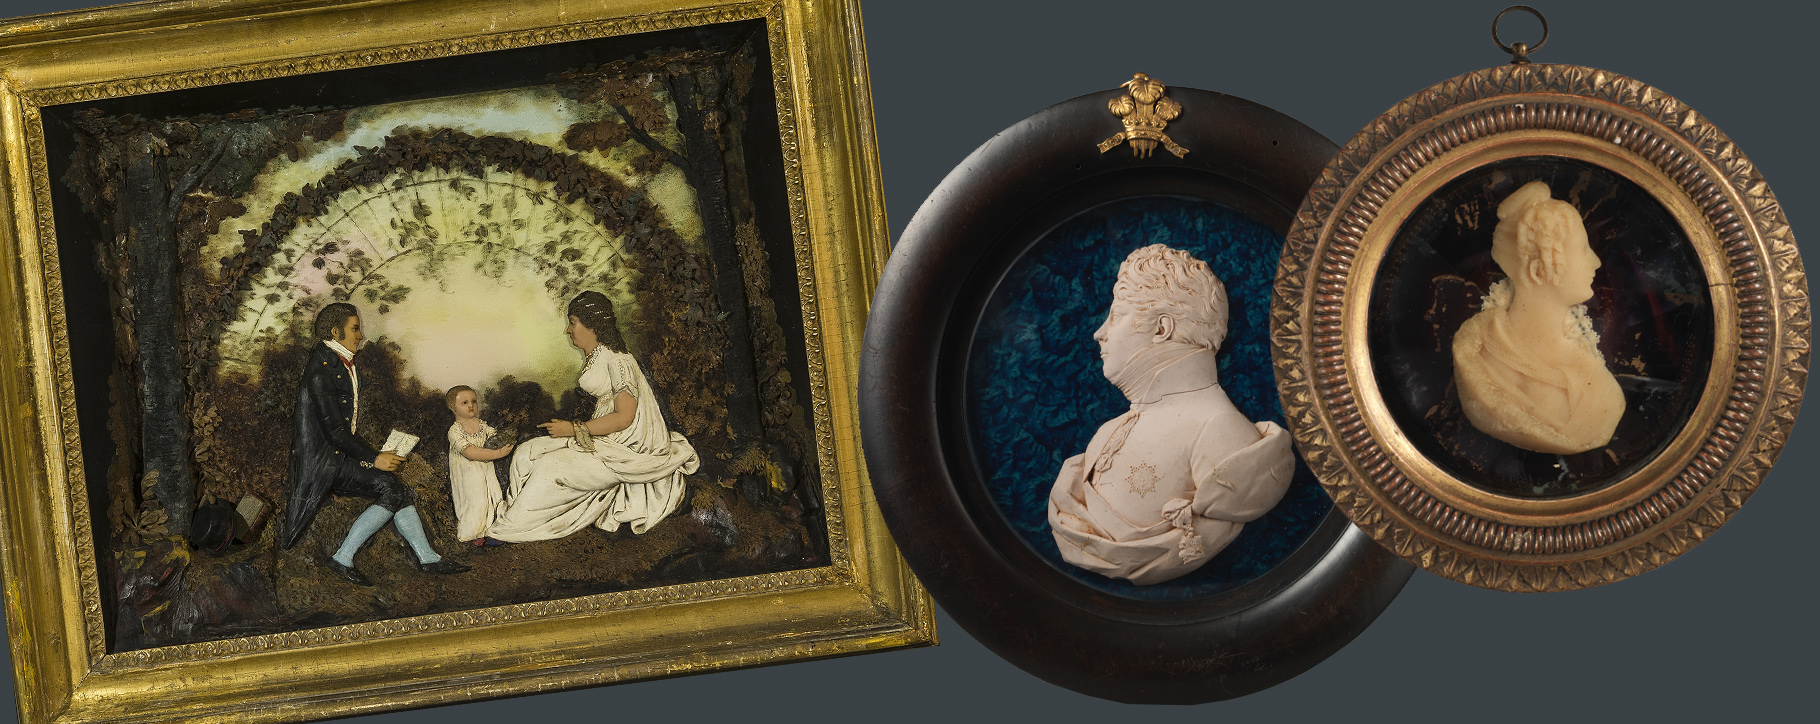 Wax Sculptures - Family Portrait Cameo